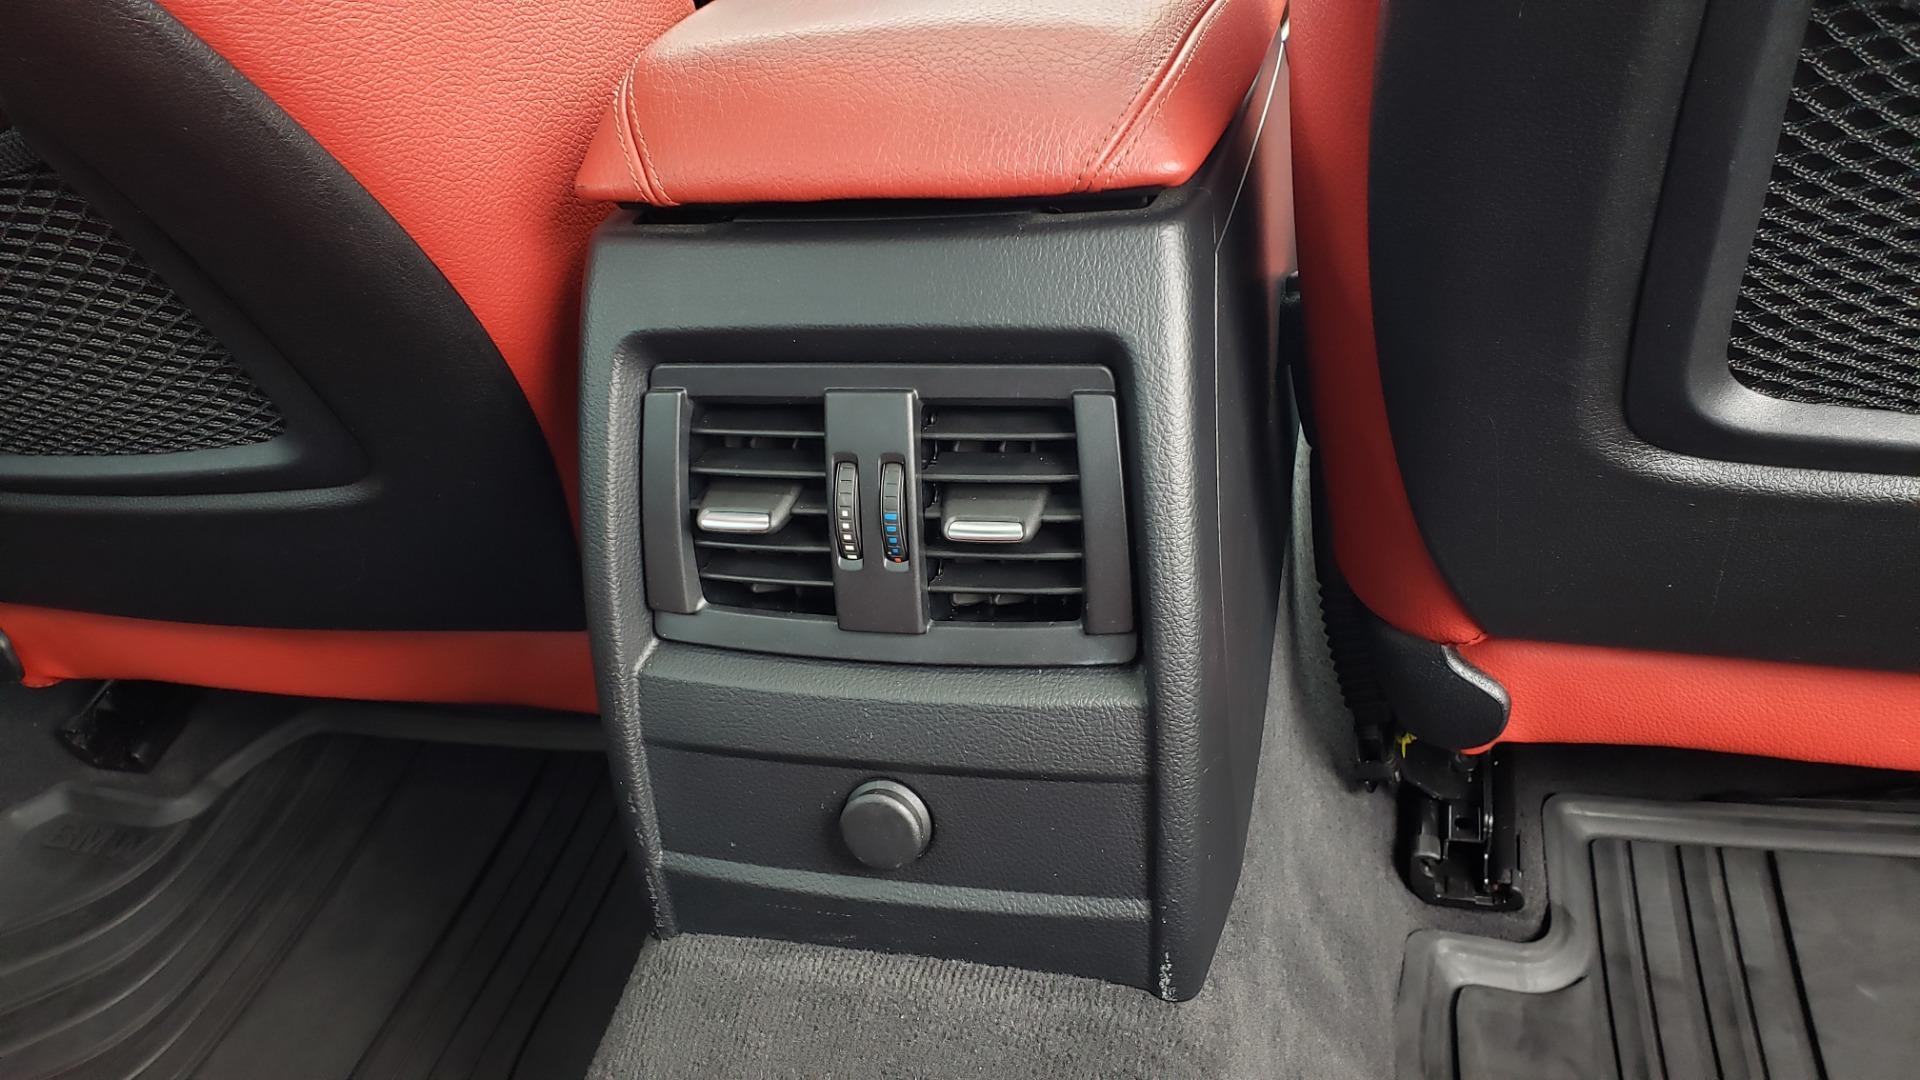 Used 2015 BMW 3 Series 335I M-SPORT / PREM PKG / HK SND / SUNROOF / REARVIEW for sale Sold at Formula Imports in Charlotte NC 28227 75